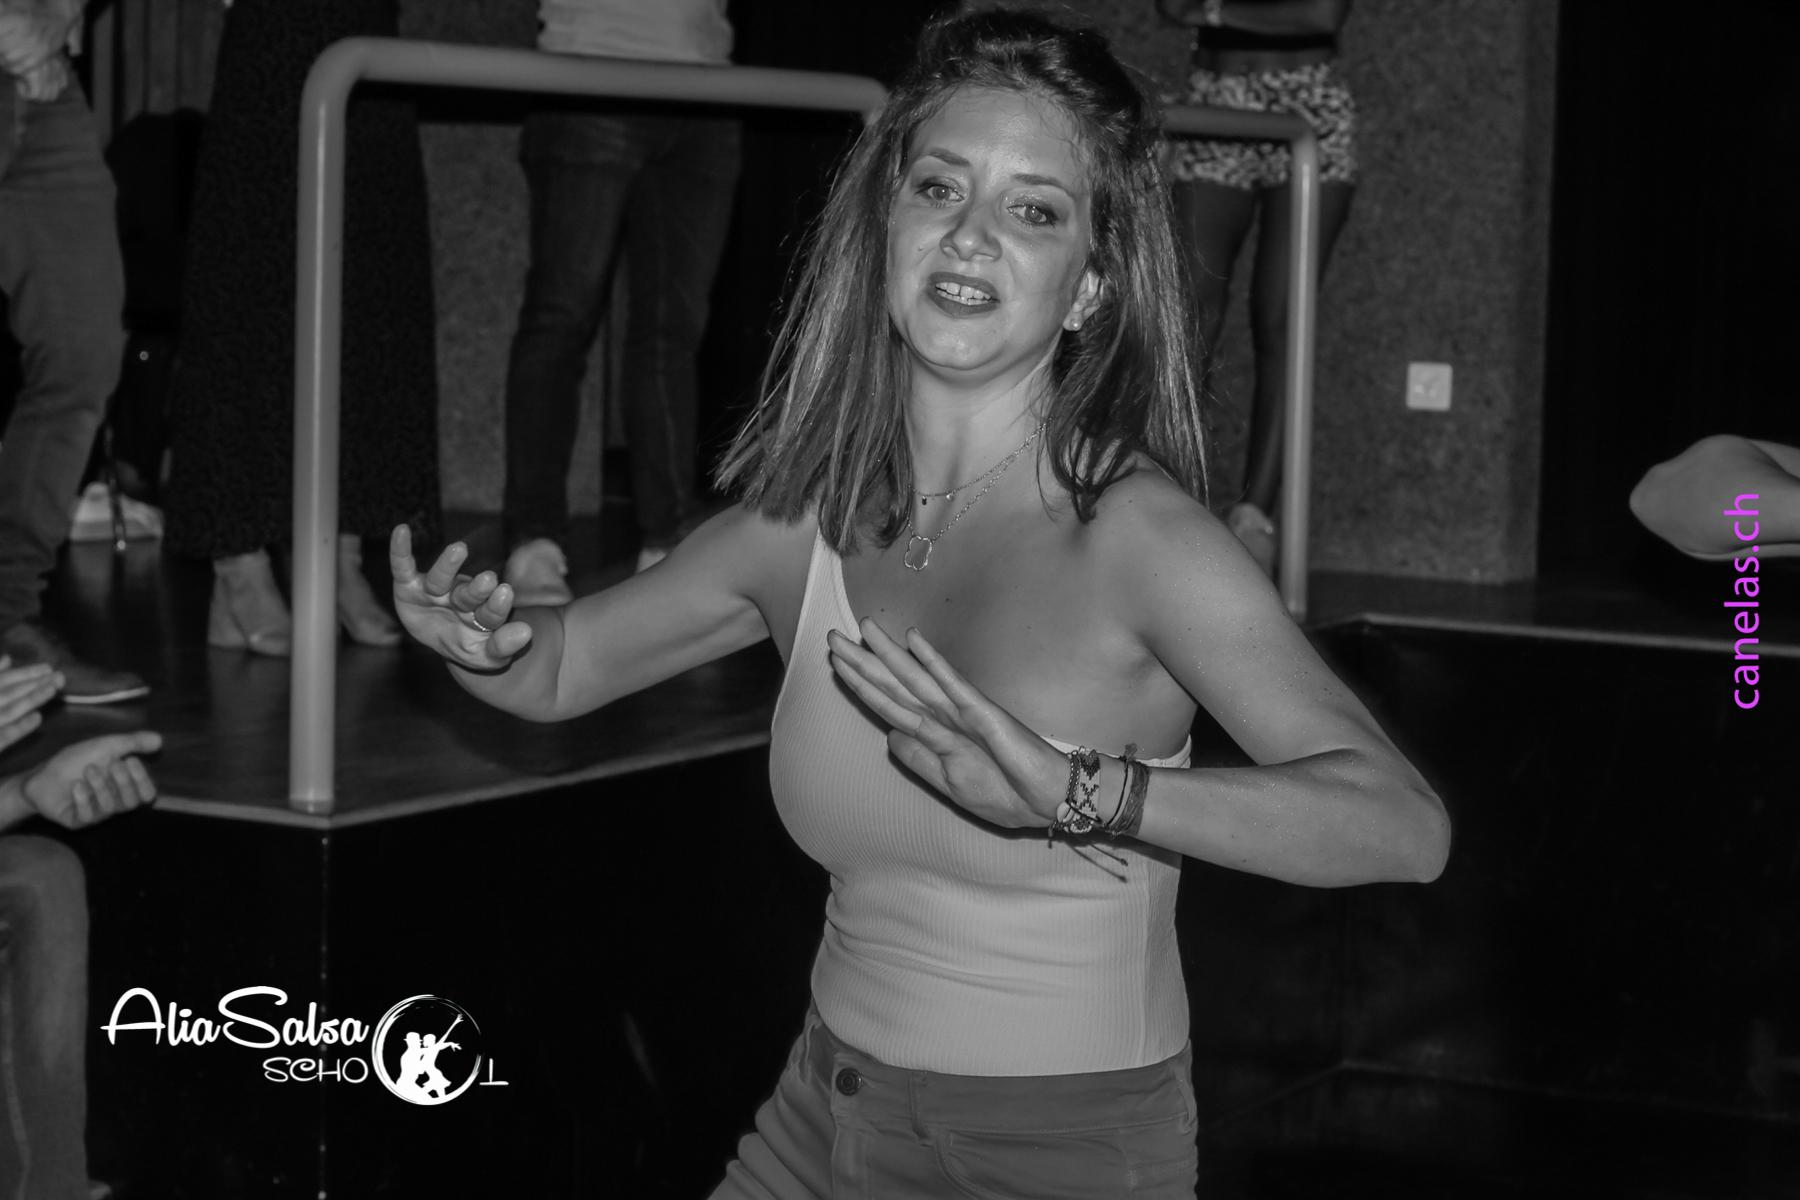 AliaSalsa ecole de danse lausanne soiree bachata salsa cubaineAlia Salsa Soireé Salsa - Bachata-4